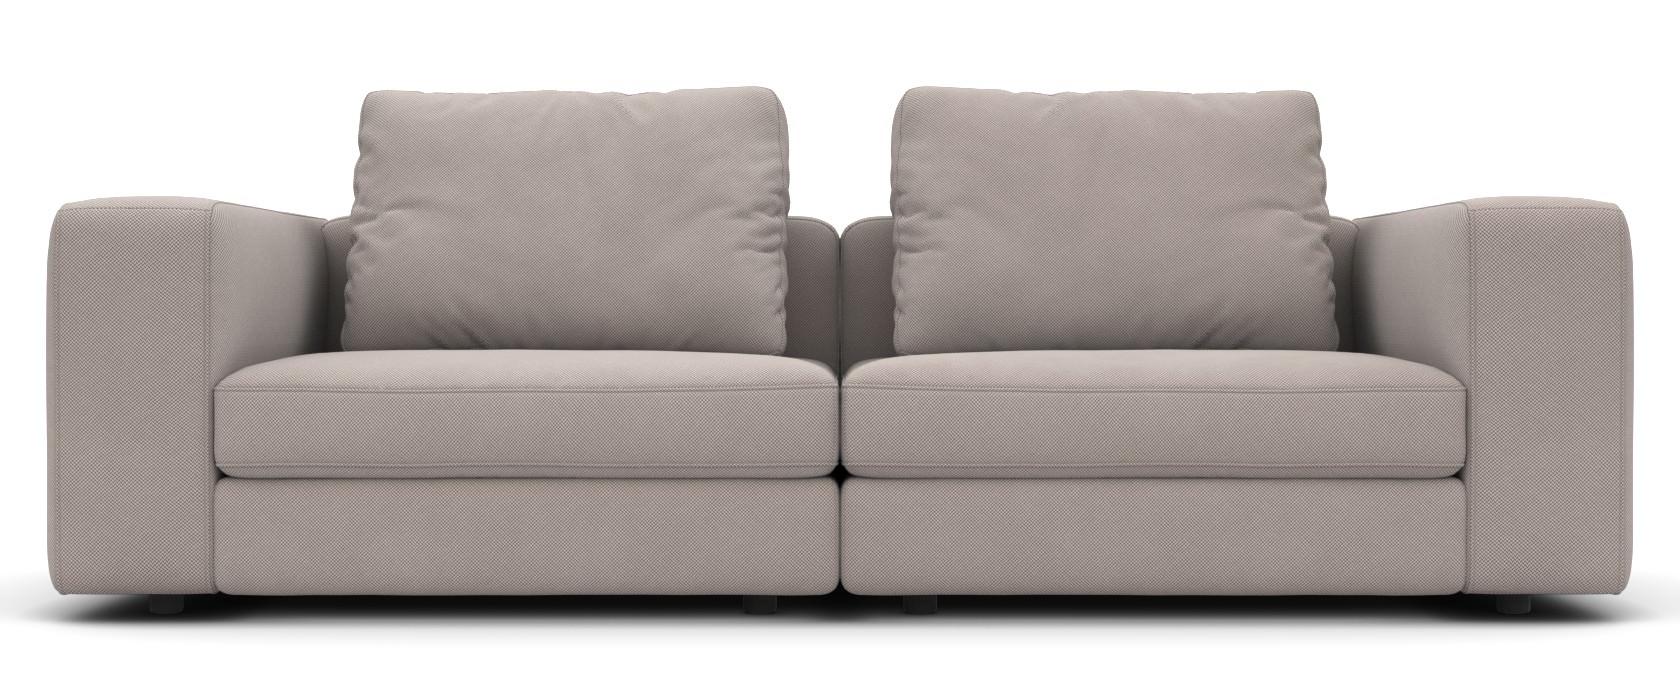 2-Sitzer Schlafsofa Domino